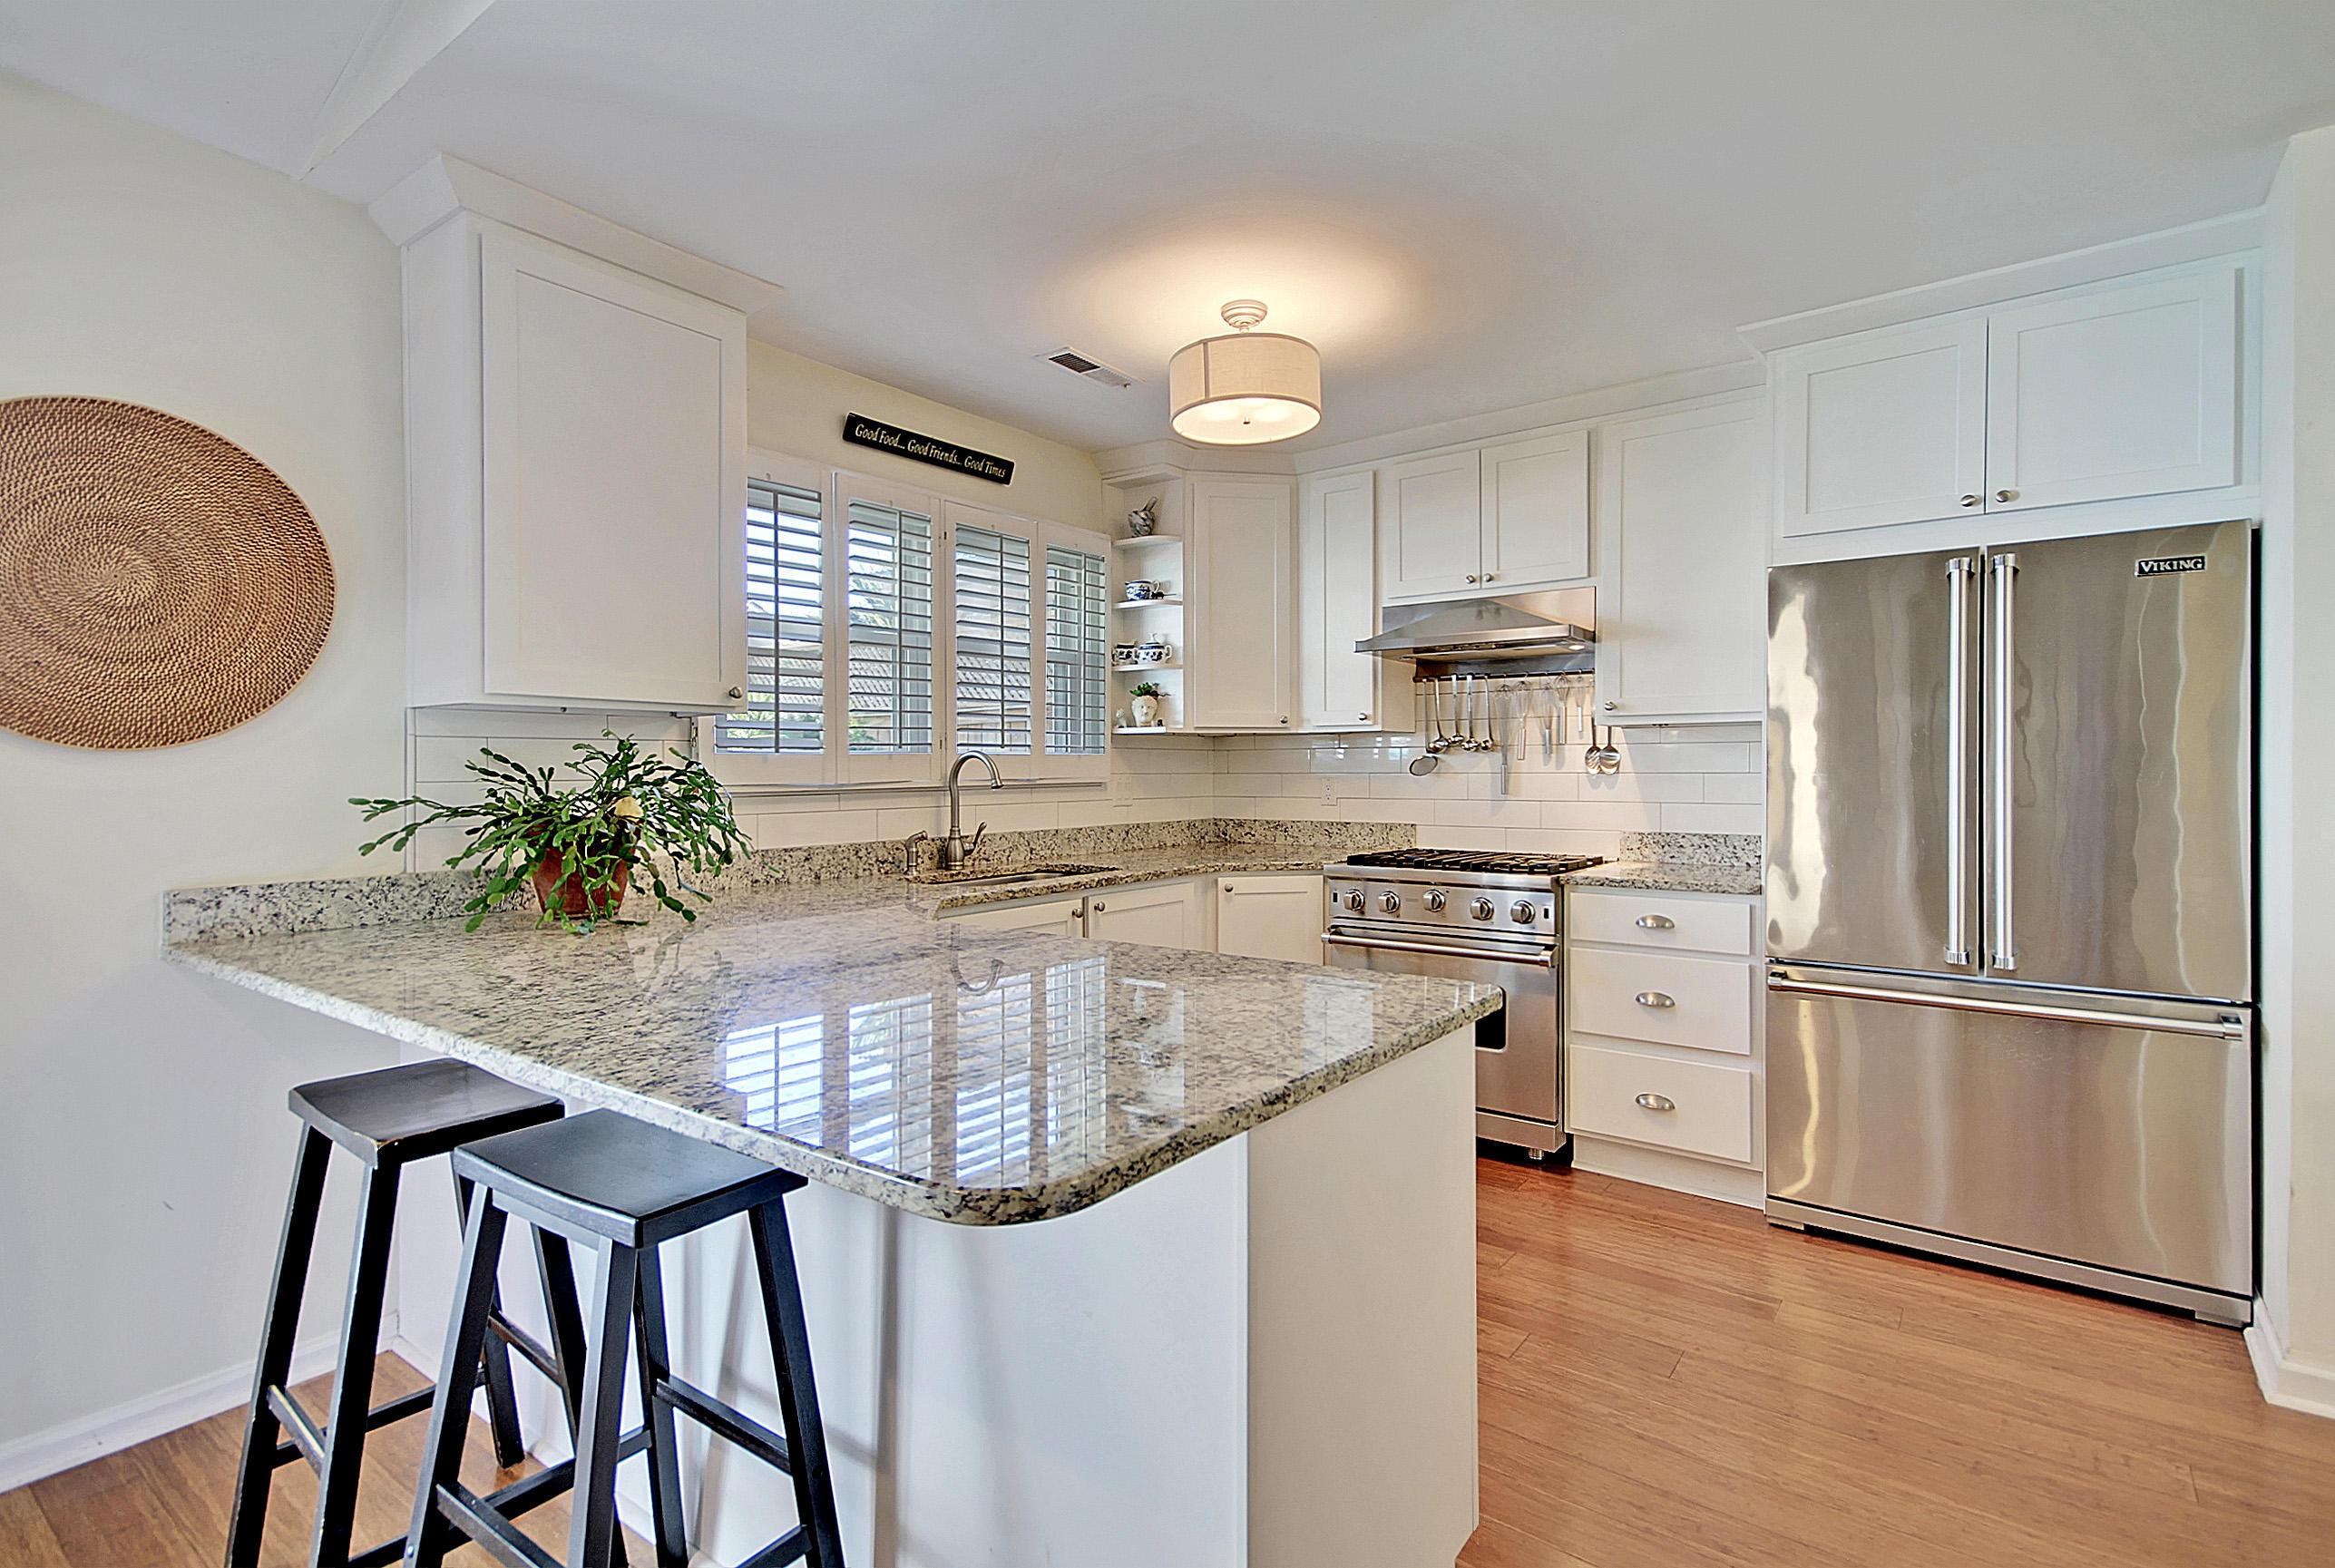 Pirates Cove Homes For Sale - 1492 Ketch, Mount Pleasant, SC - 20